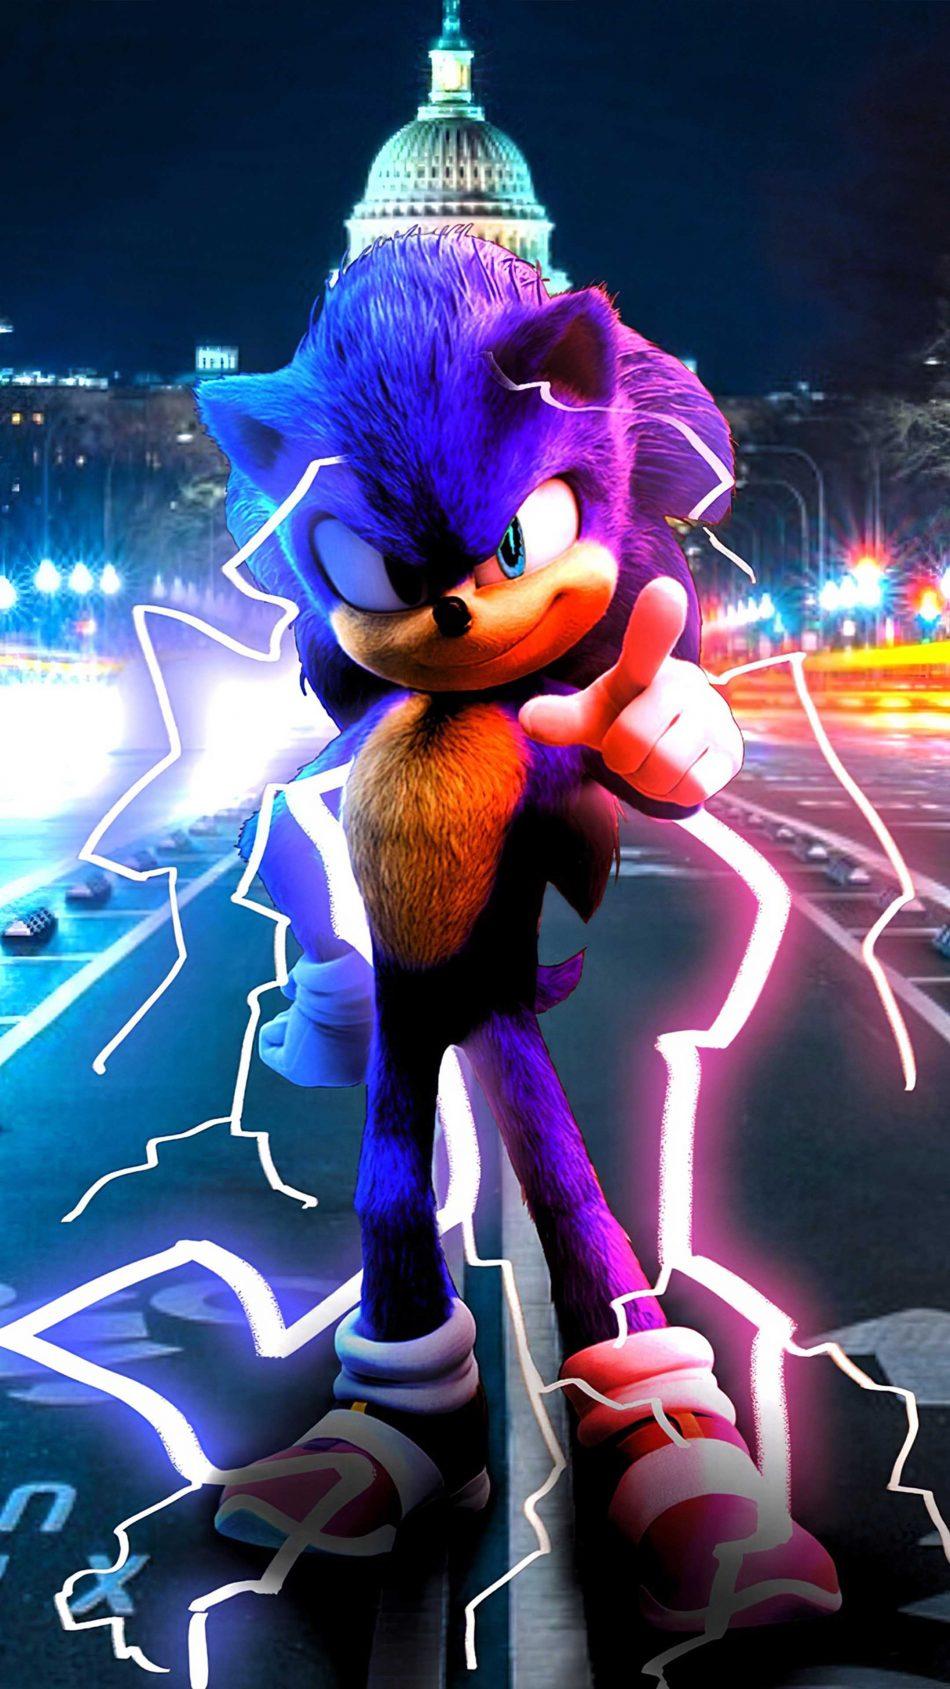 Sonic The Hedgehog Poster 2020 4K Ultra HD Mobile Wallpaper